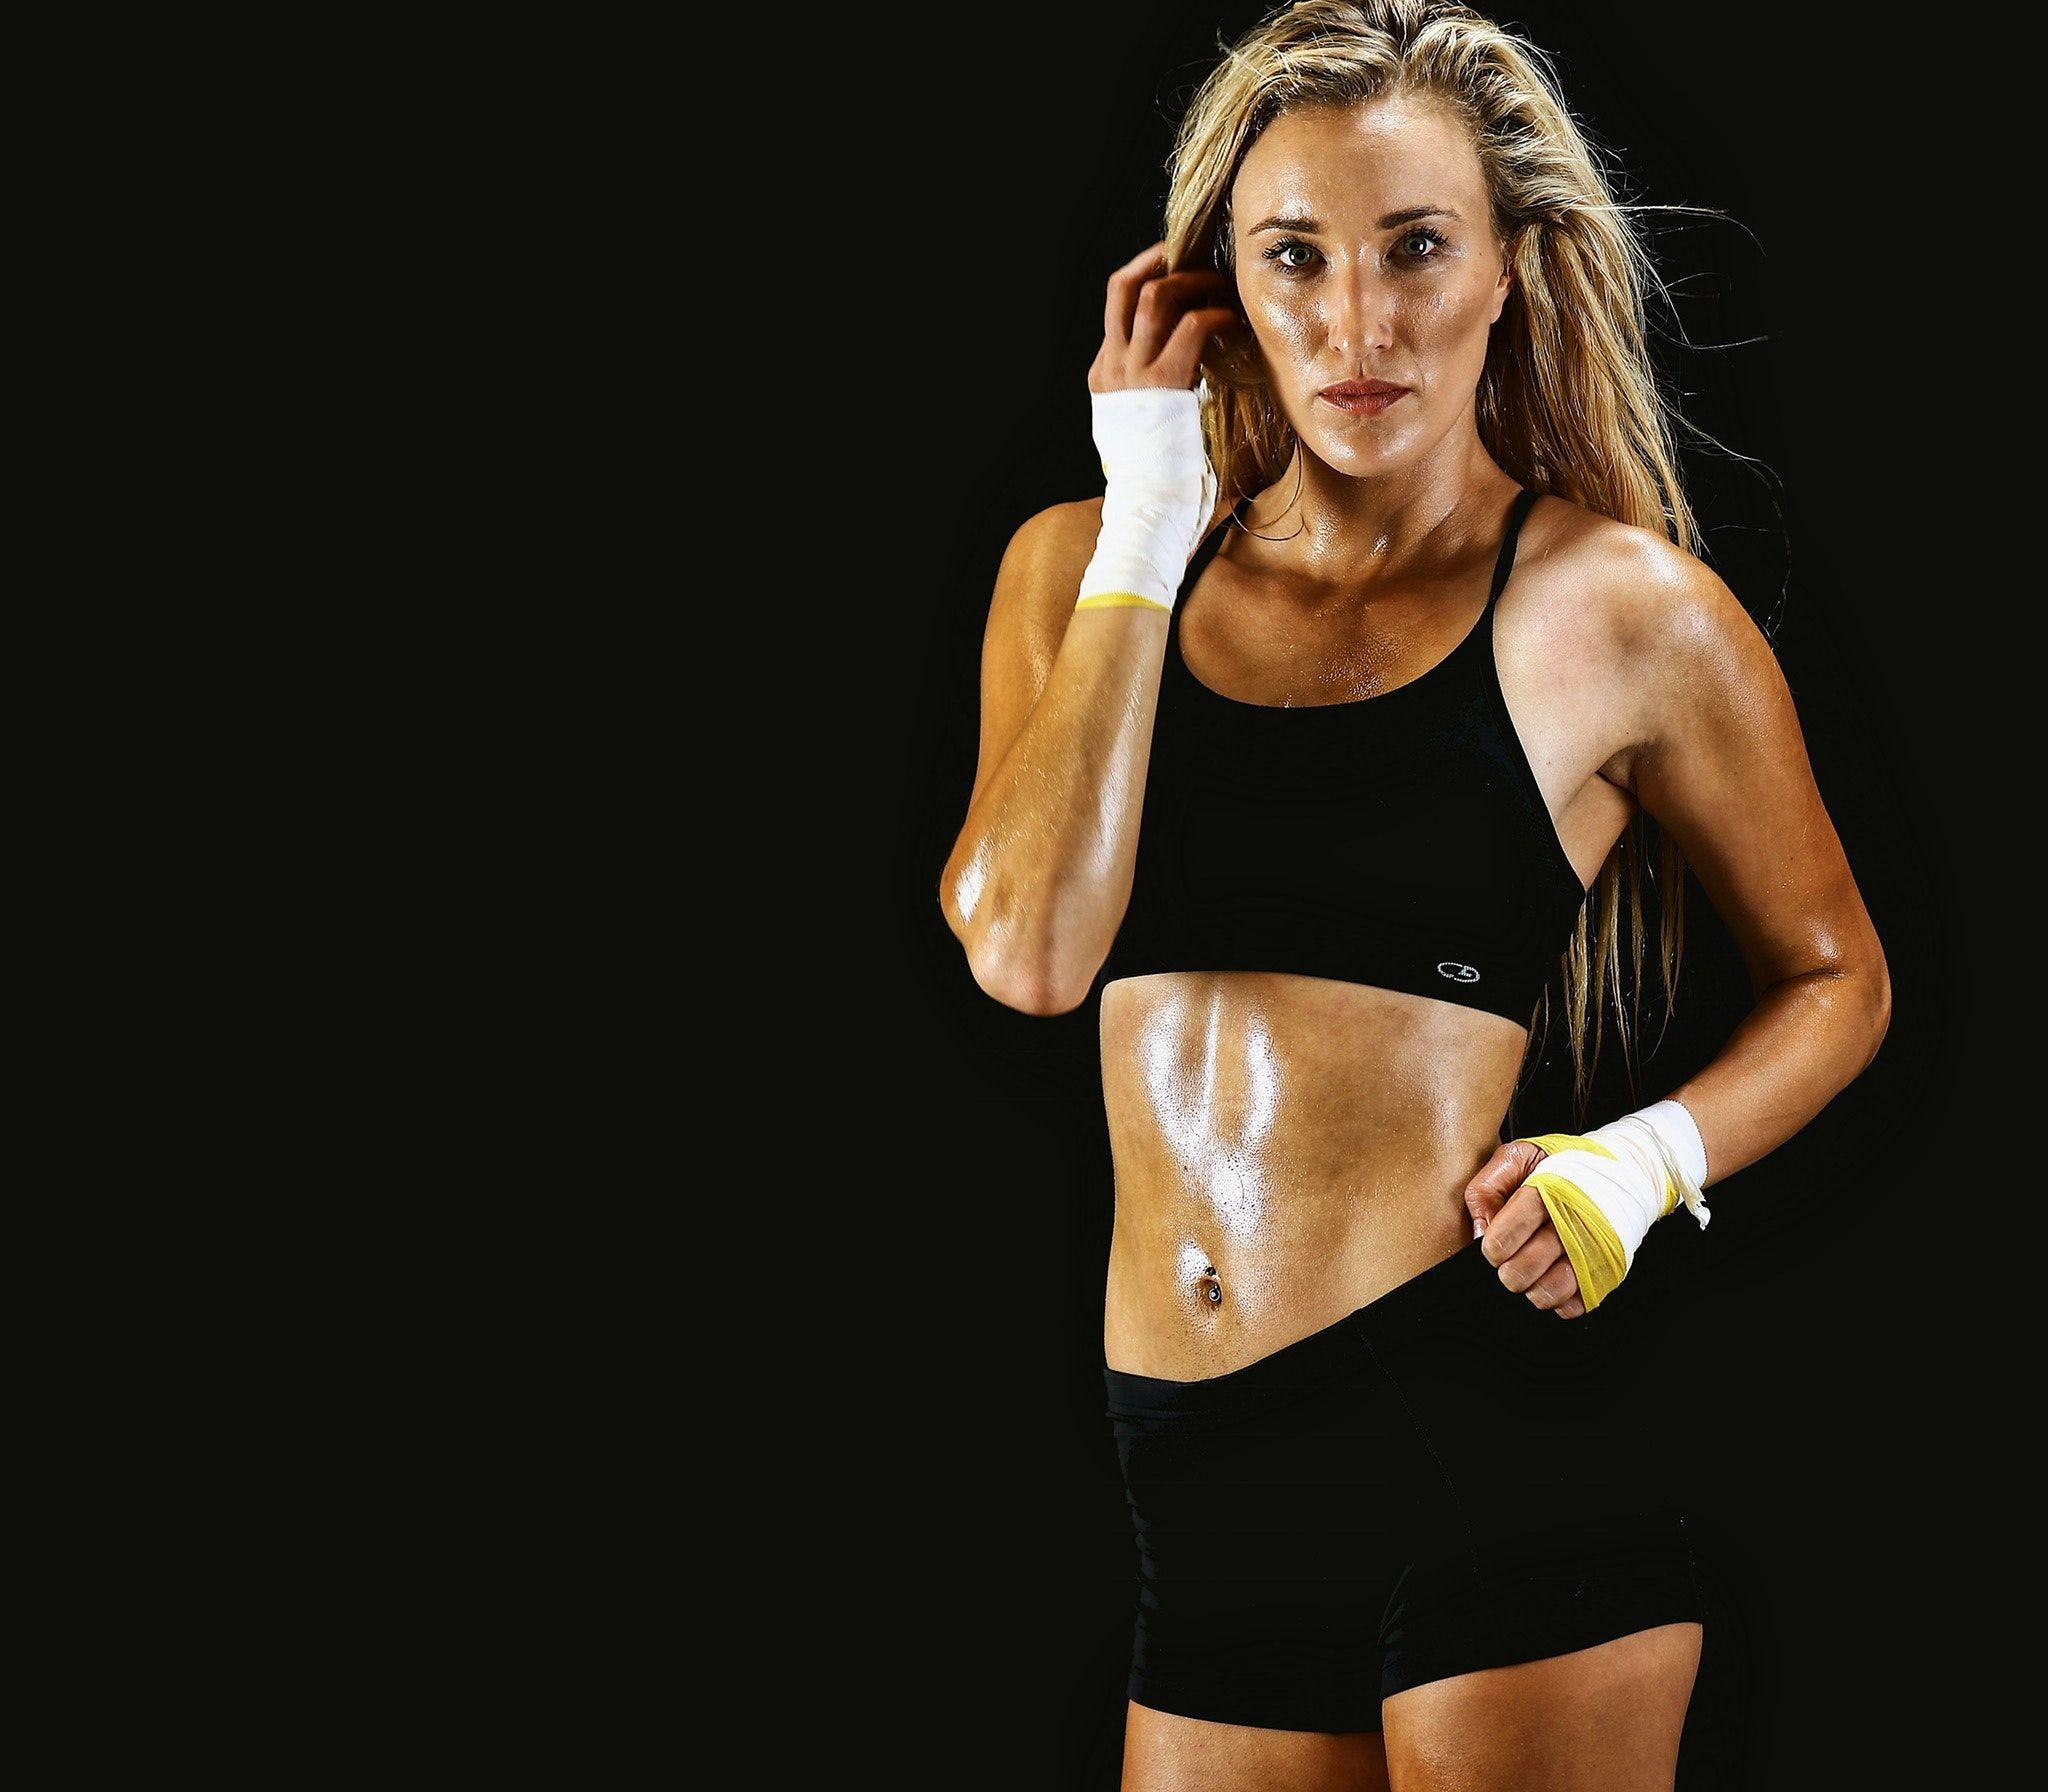 gym workout clothes स्पोर्ट्स ब्रा और जिम वर्कआउट